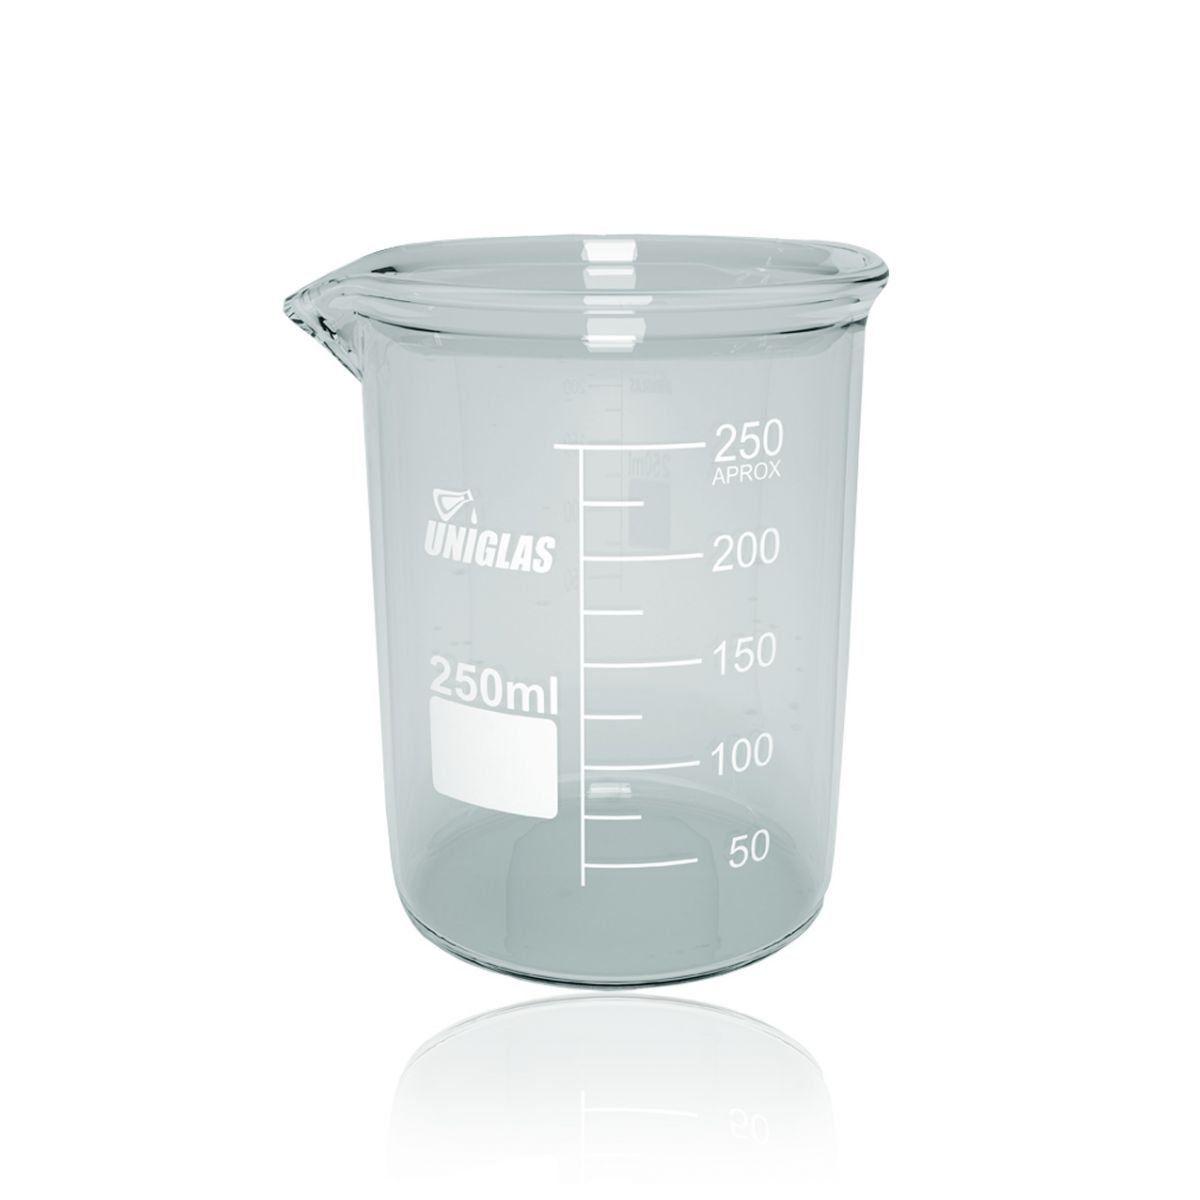 Copo Becker FB (Griffin) Graduado 100 ml - CAIXA com 10 und. Uniglas